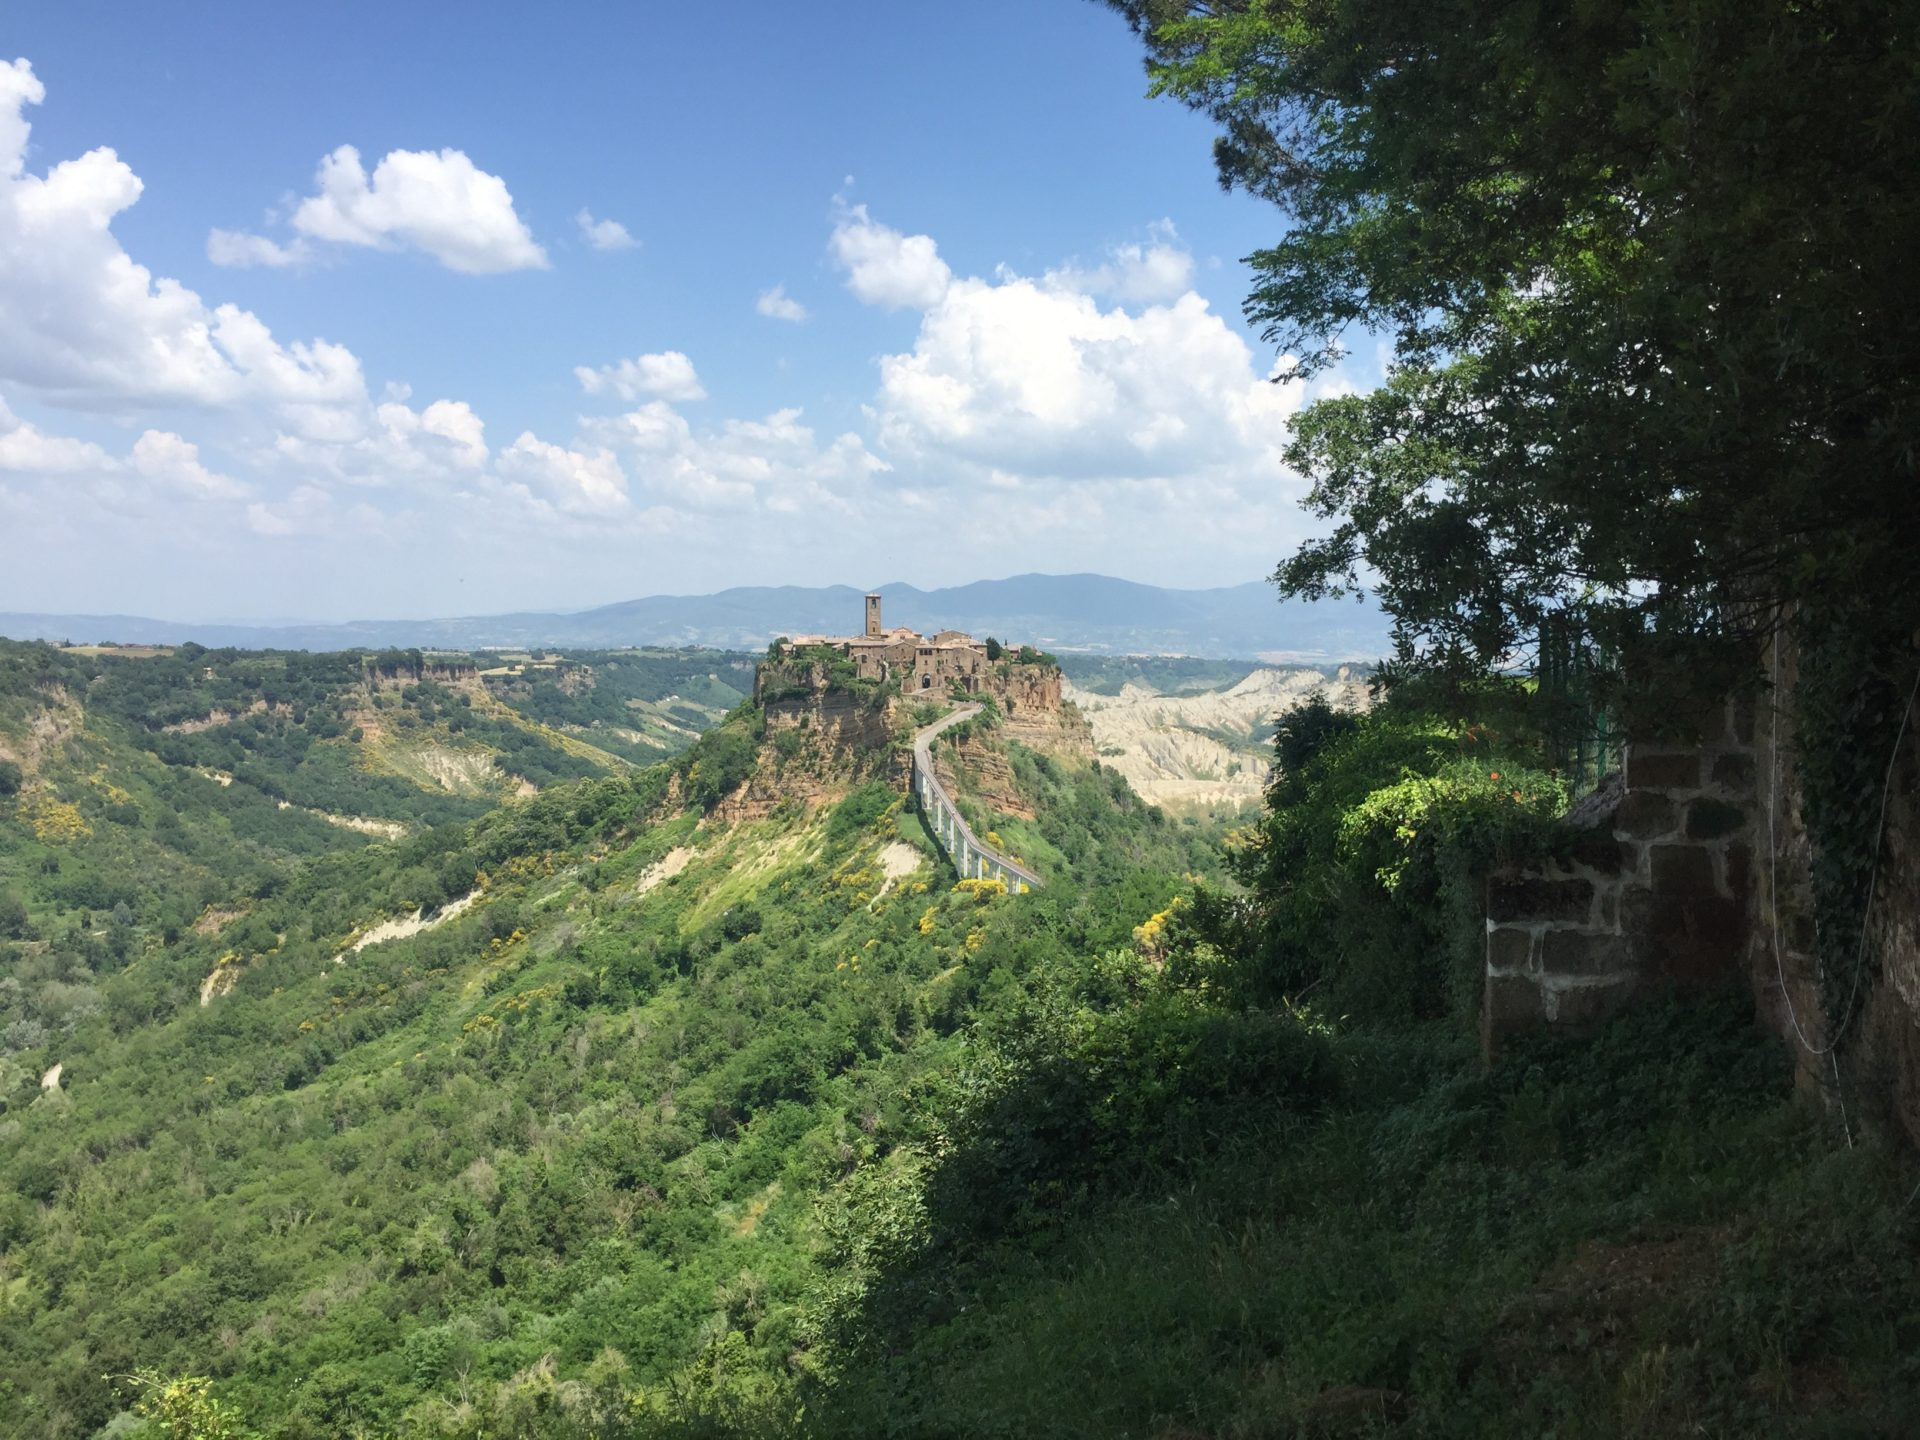 "<img src=""http://marenostrum.pl/wp-content/uploads//2019/09/Civita-di-Bagnoregio-widok.jpeg"" alt=""Civita di Bagnoregio"" />"